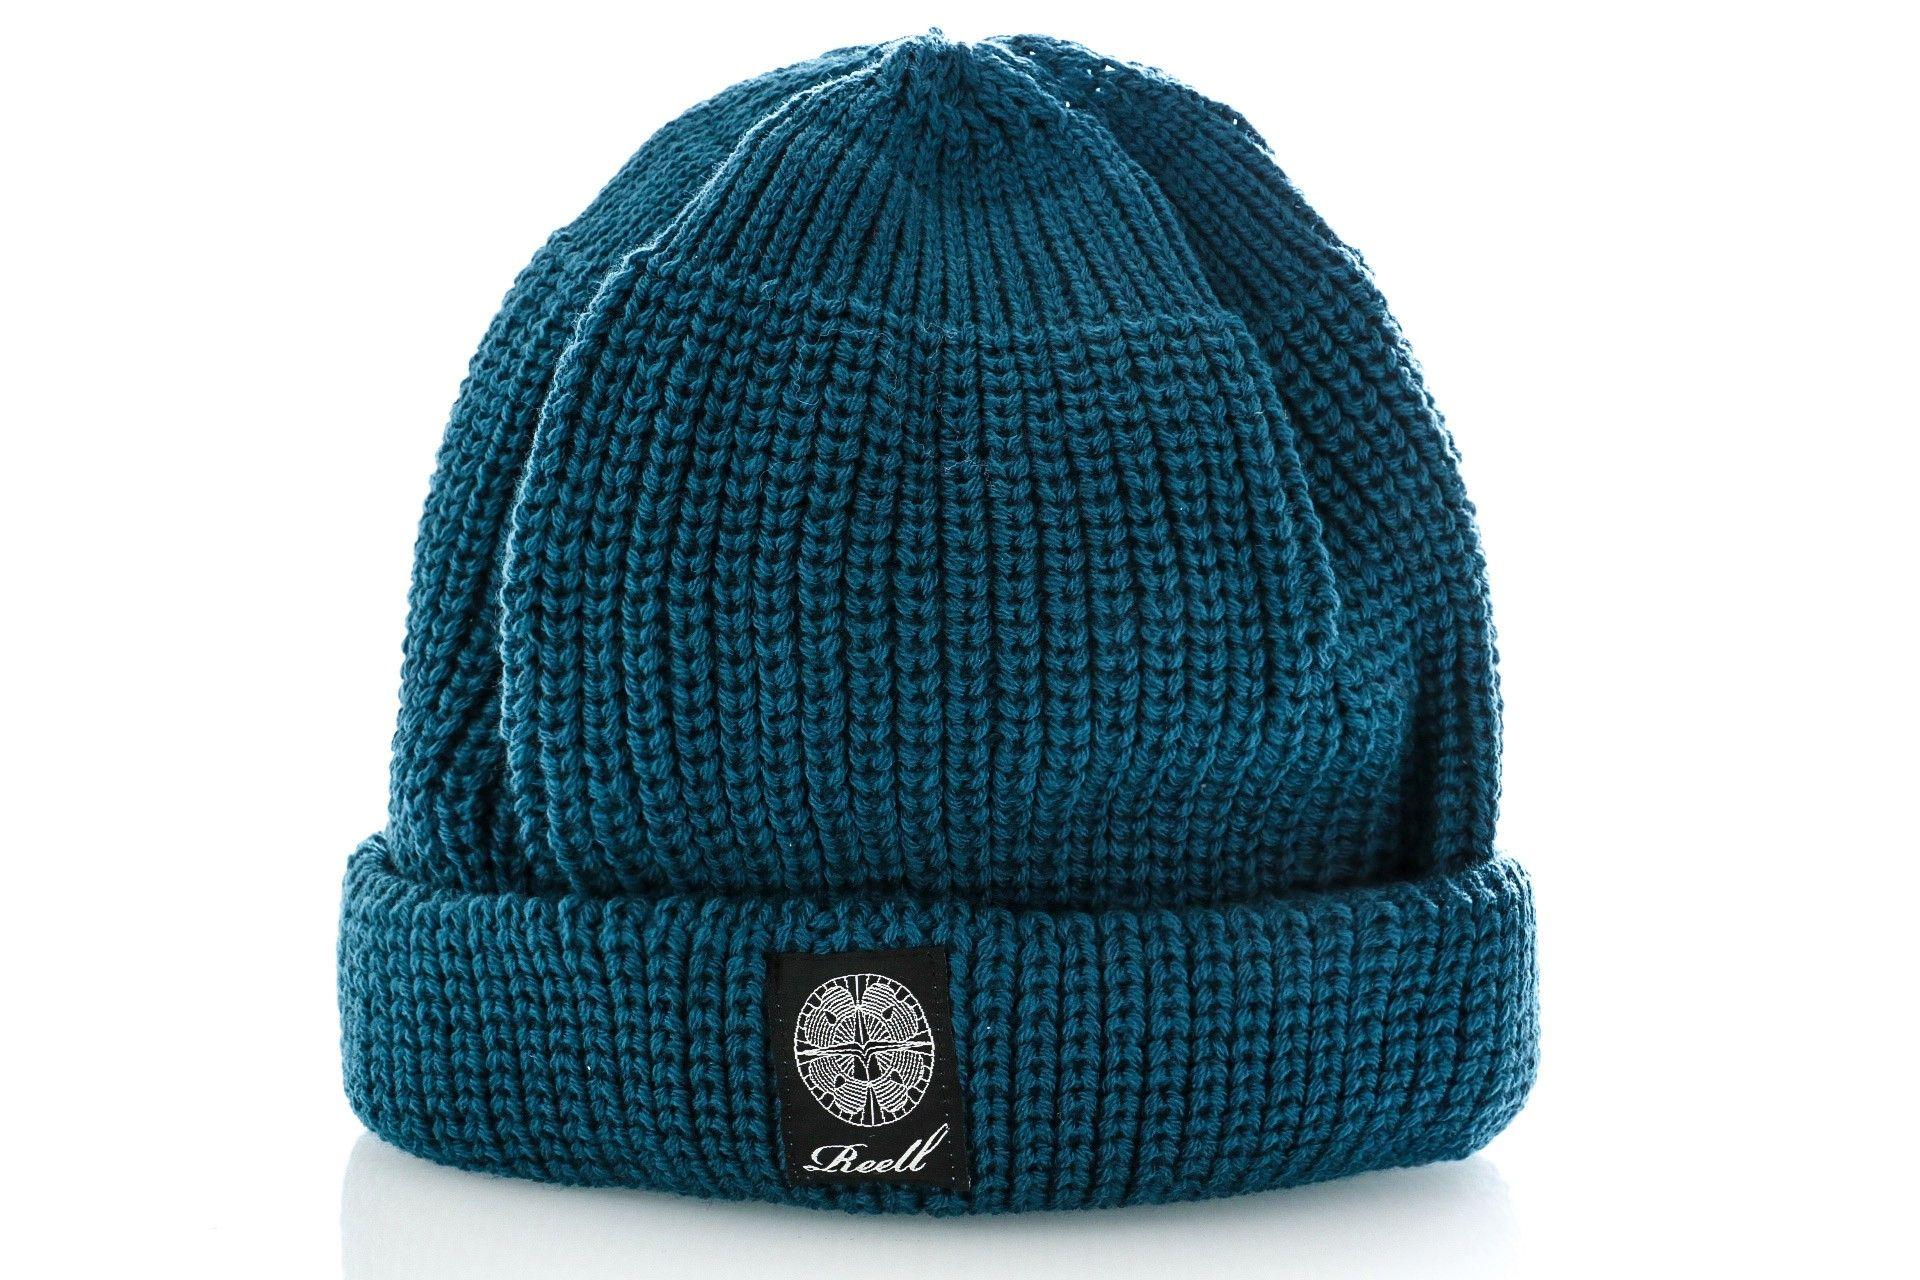 Afbeelding van Reell Muts Short Knit Beanie Petrol Blue 1404-002